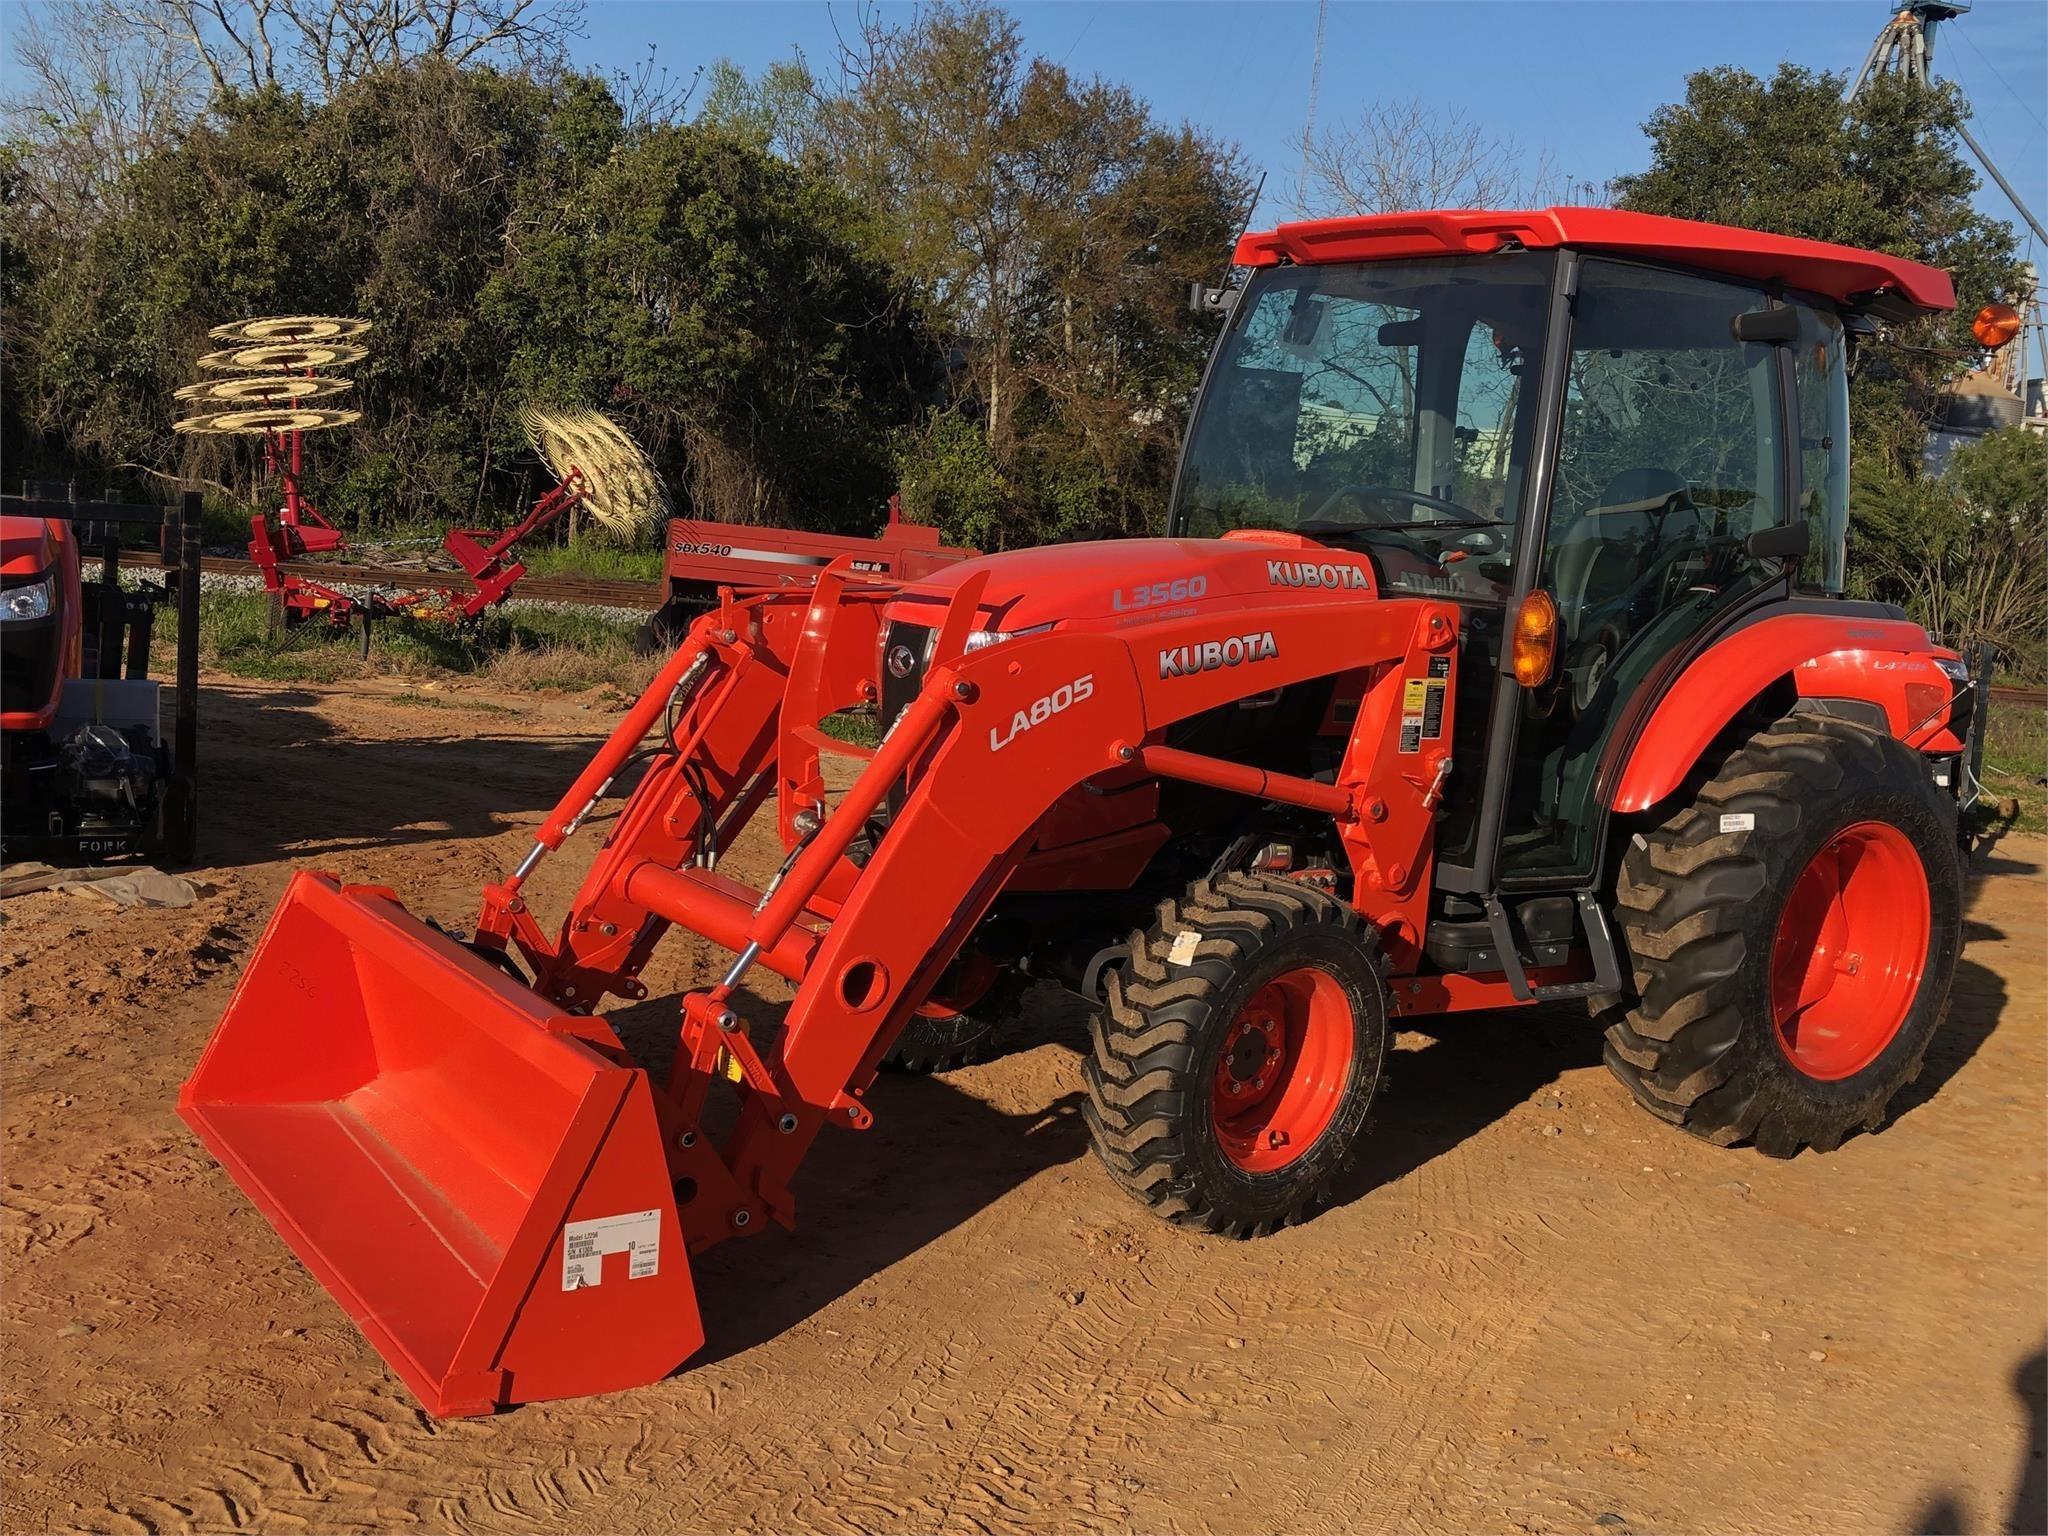 2021 Kubota L3560 Tractor